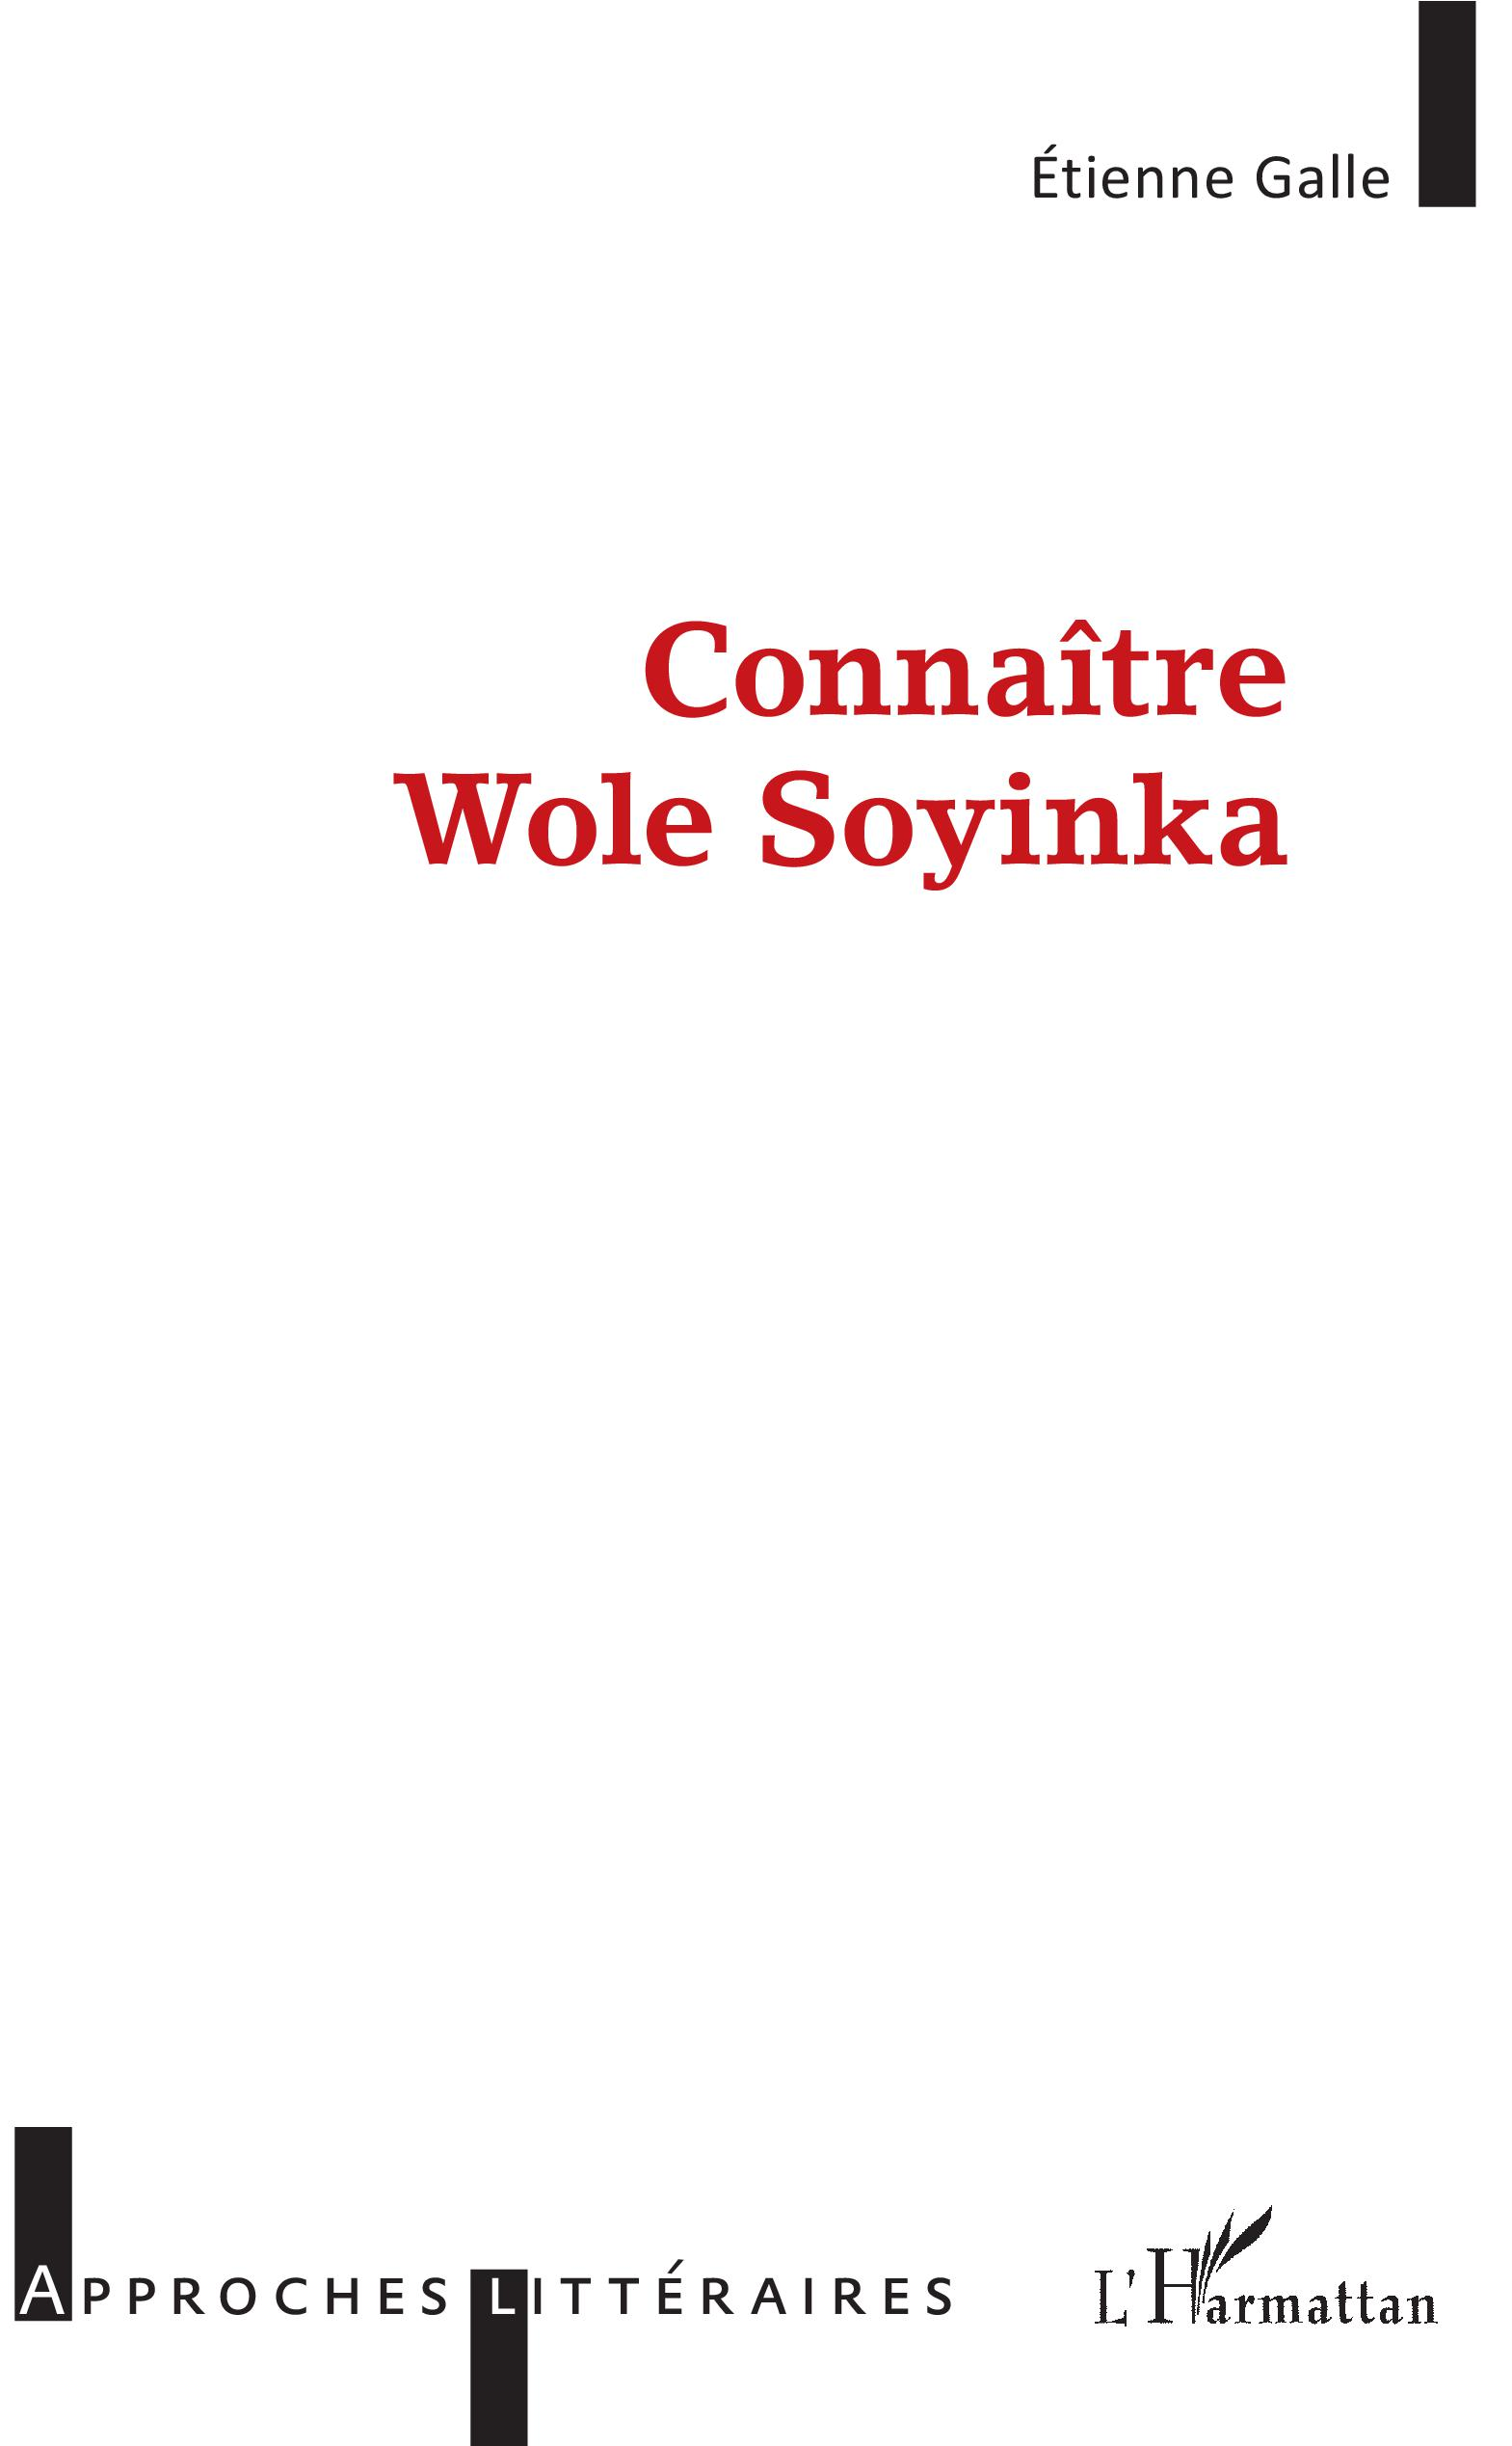 E. Galle, Connaître Wole Soyinka